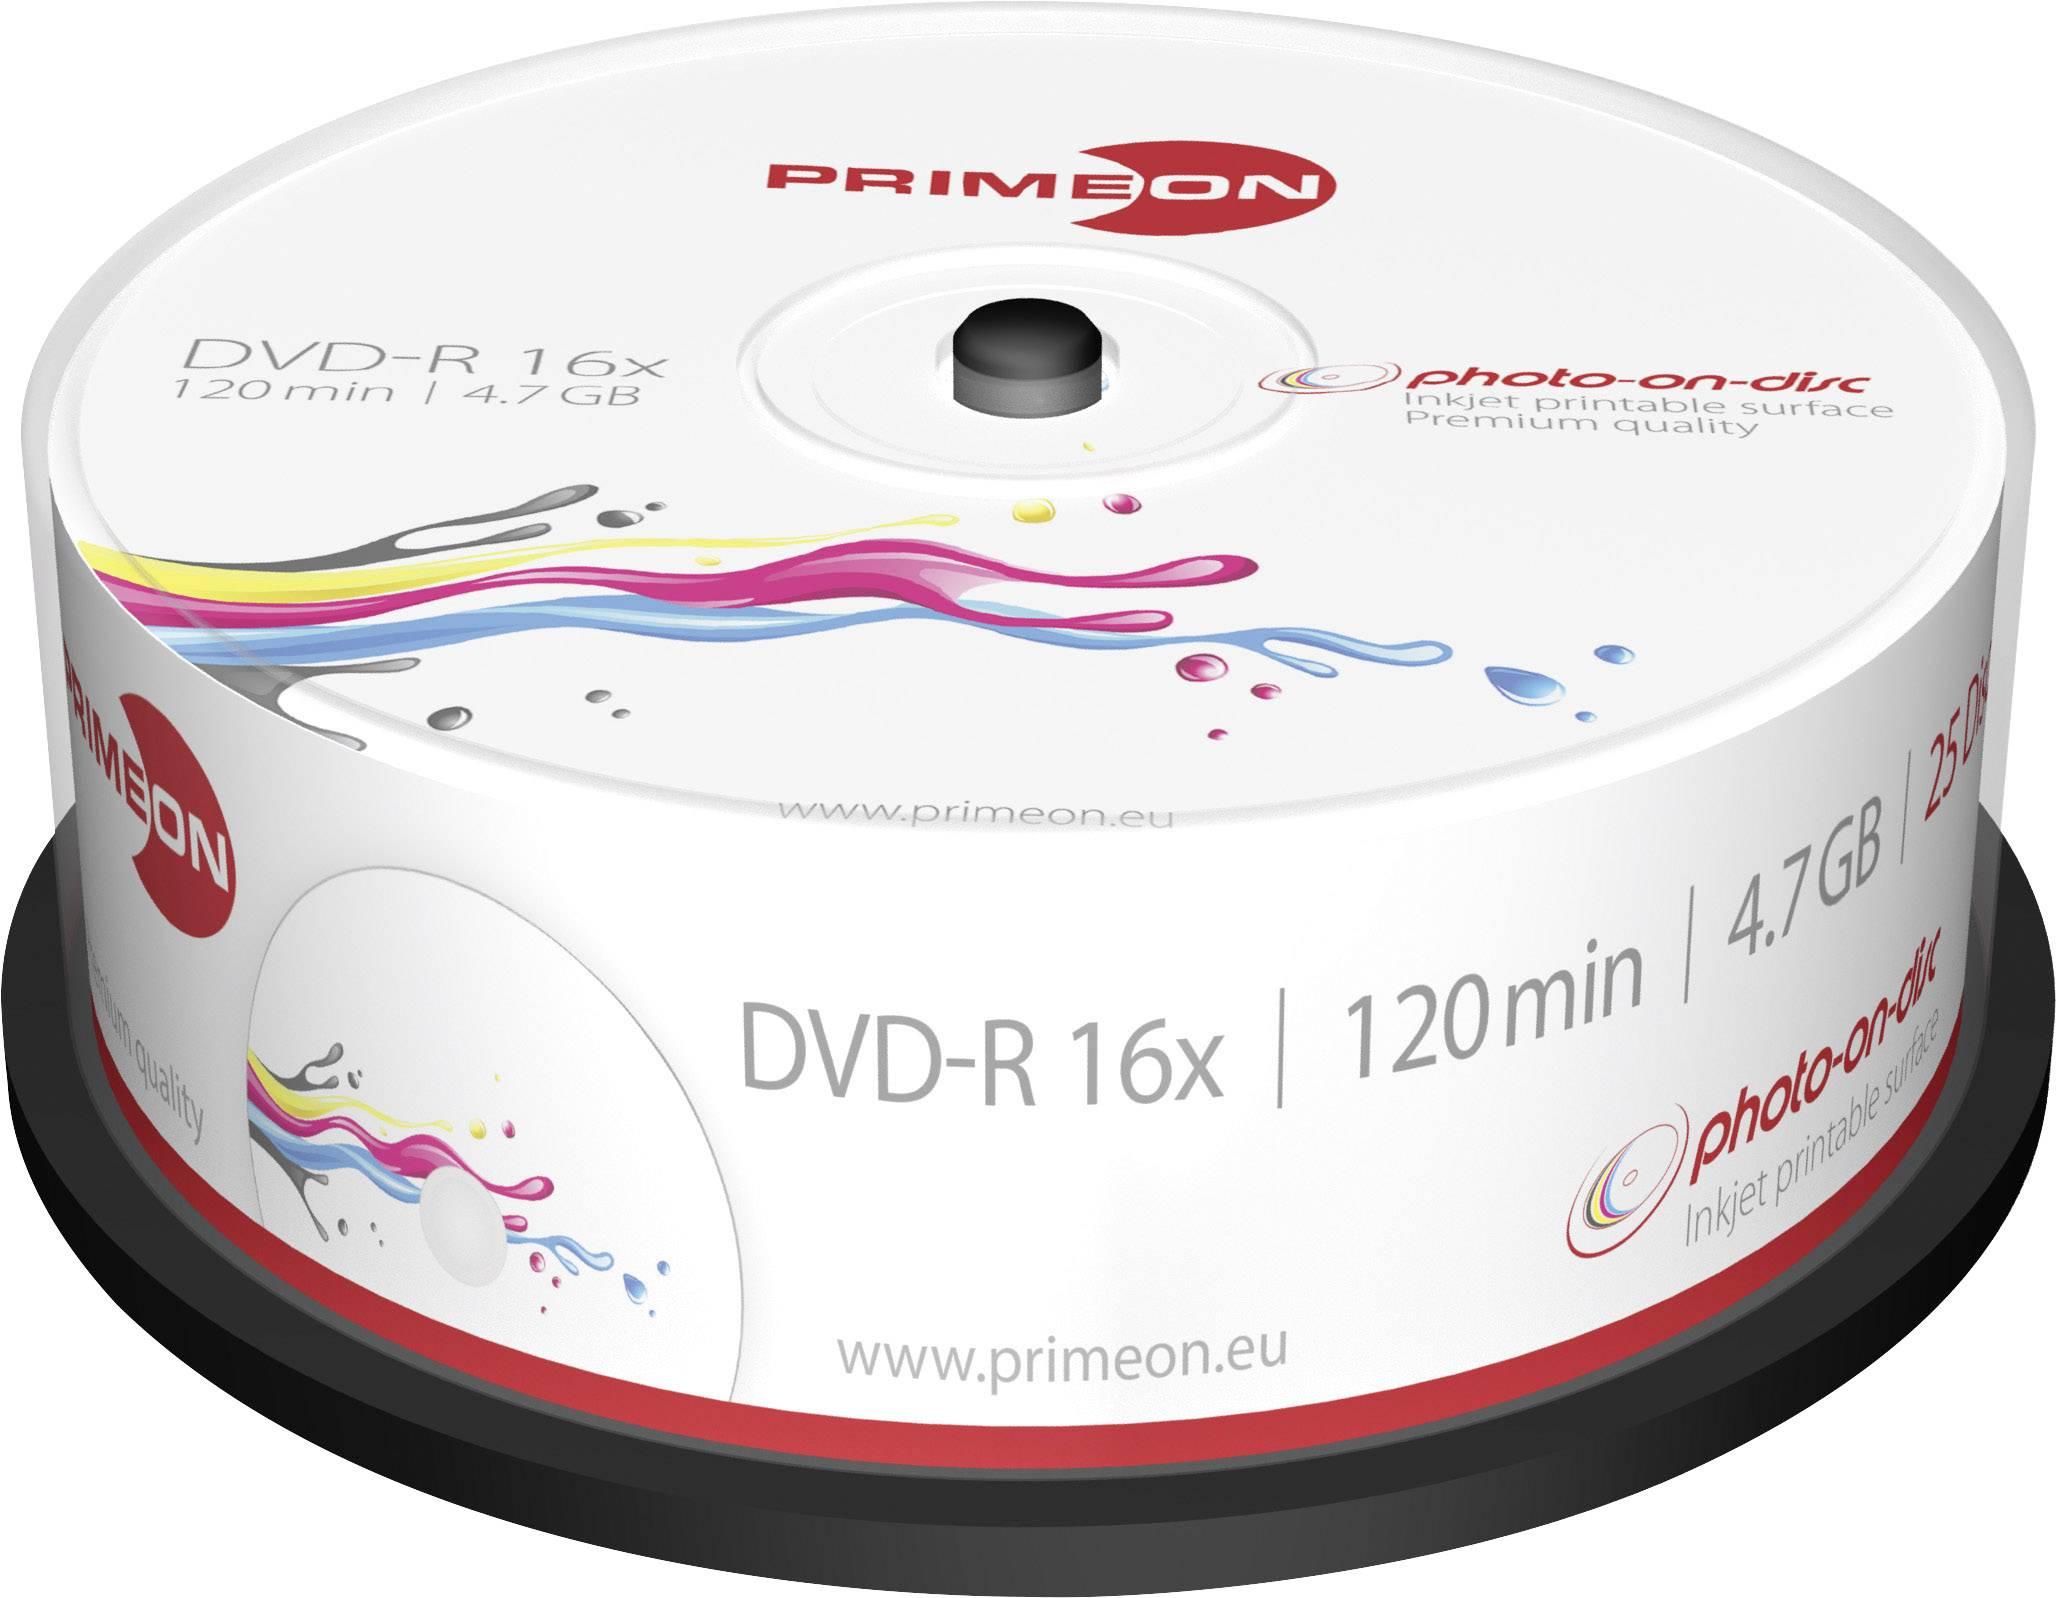 photo regarding Printable Dvd Rohlinge titled DVD Blank Media